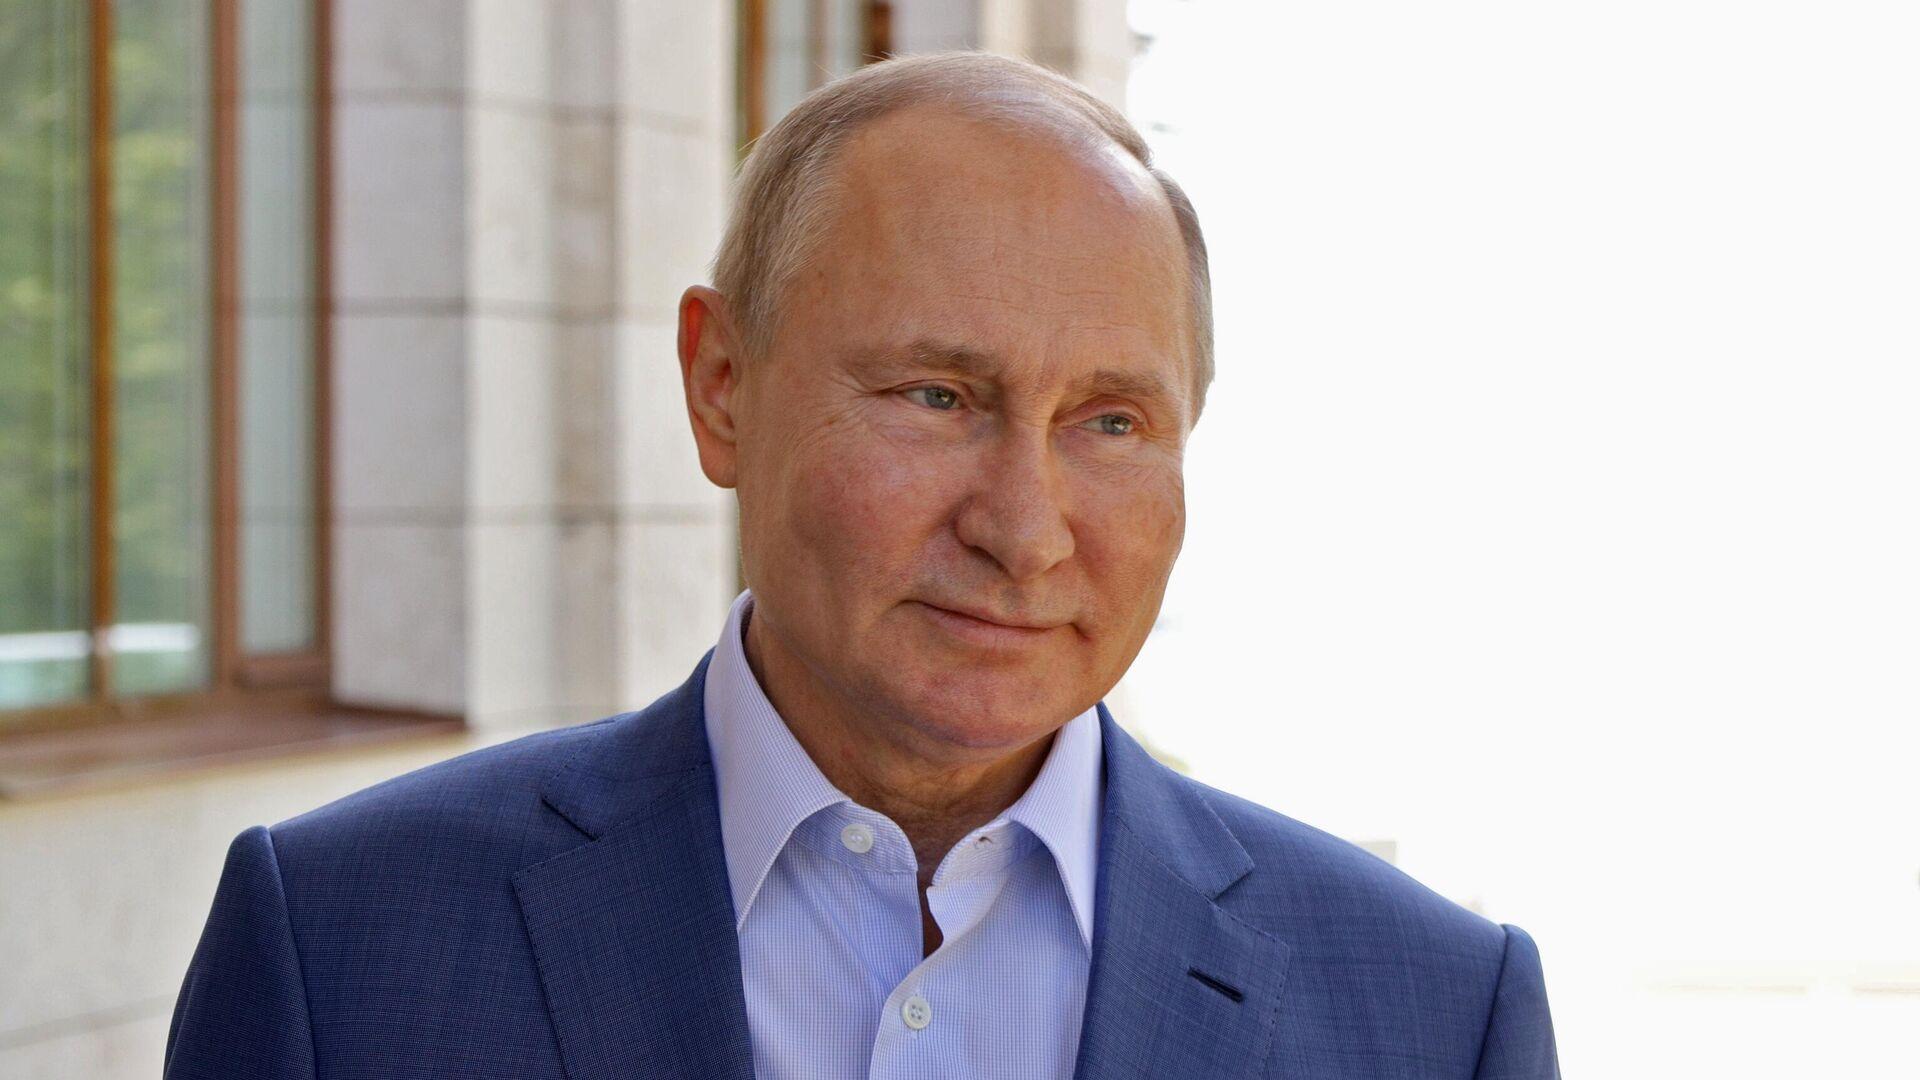 Президент РФ Владимир Путин в Сочи. 10 мая 2021 - РИА Новости, 1920, 22.09.2021